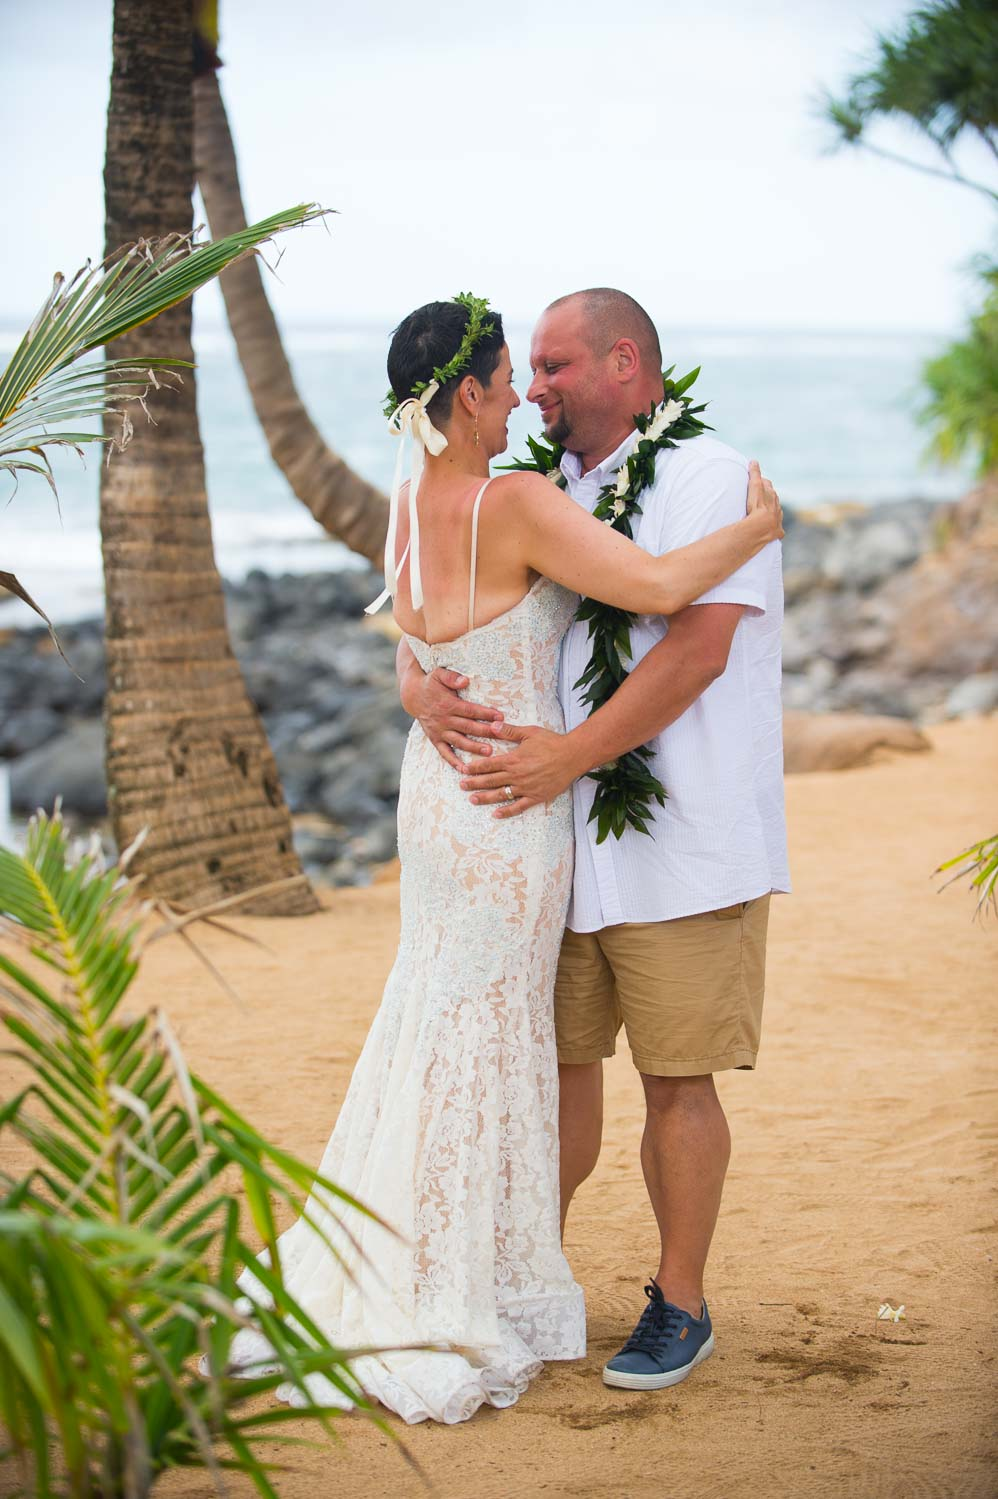 maui-wedding-photography-maui-wedding-venue-Tad-Craig-Photography-36.jpg